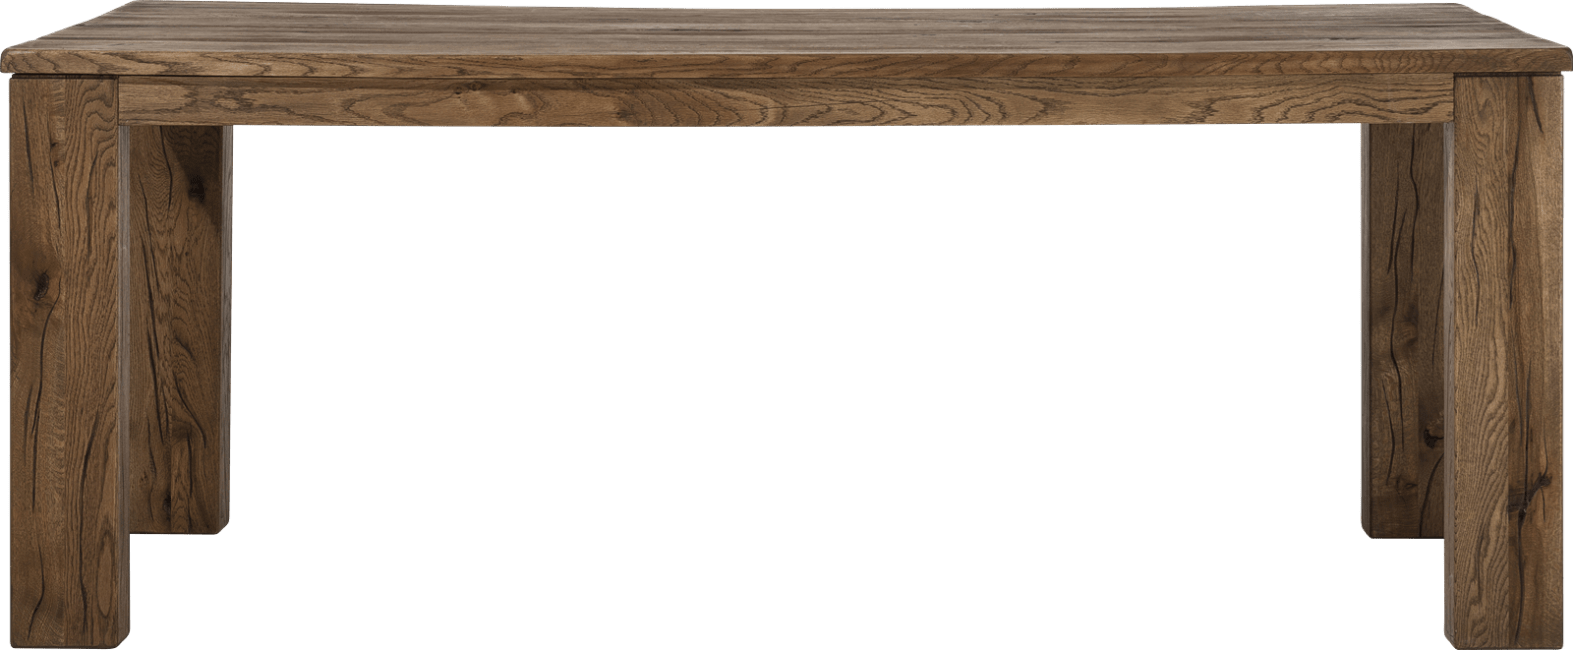 Masters - eetkamertafel 200 x 100 cm - hout 12x12/10x14